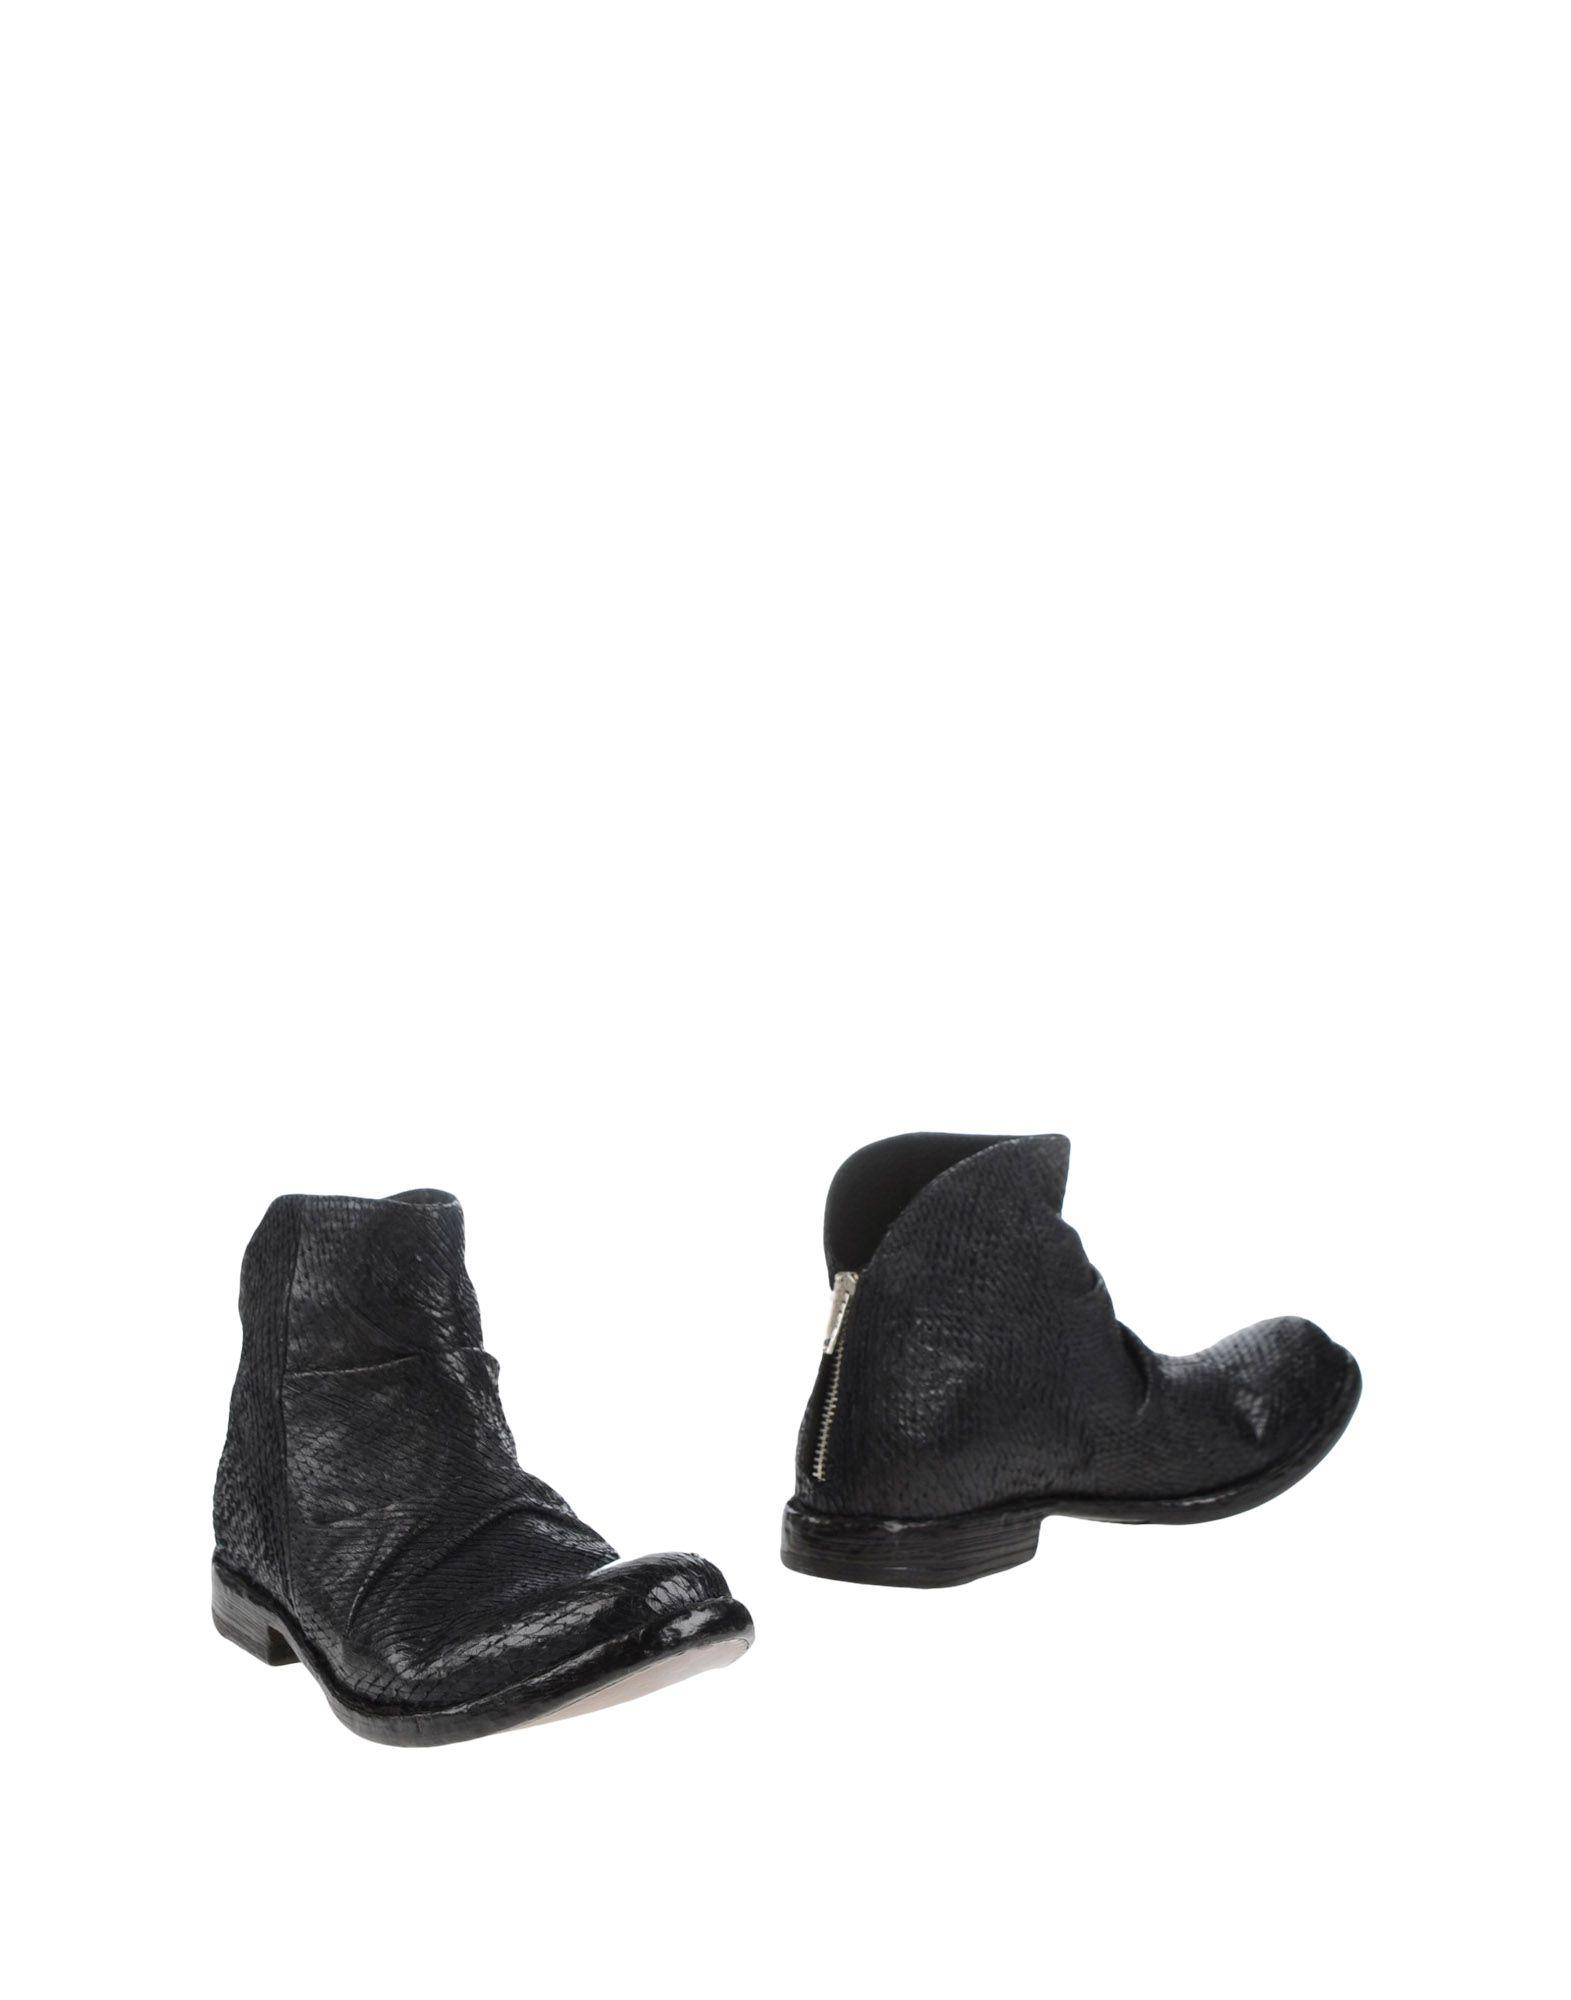 ФОТО open closed shoes полусапоги и высокие ботинки